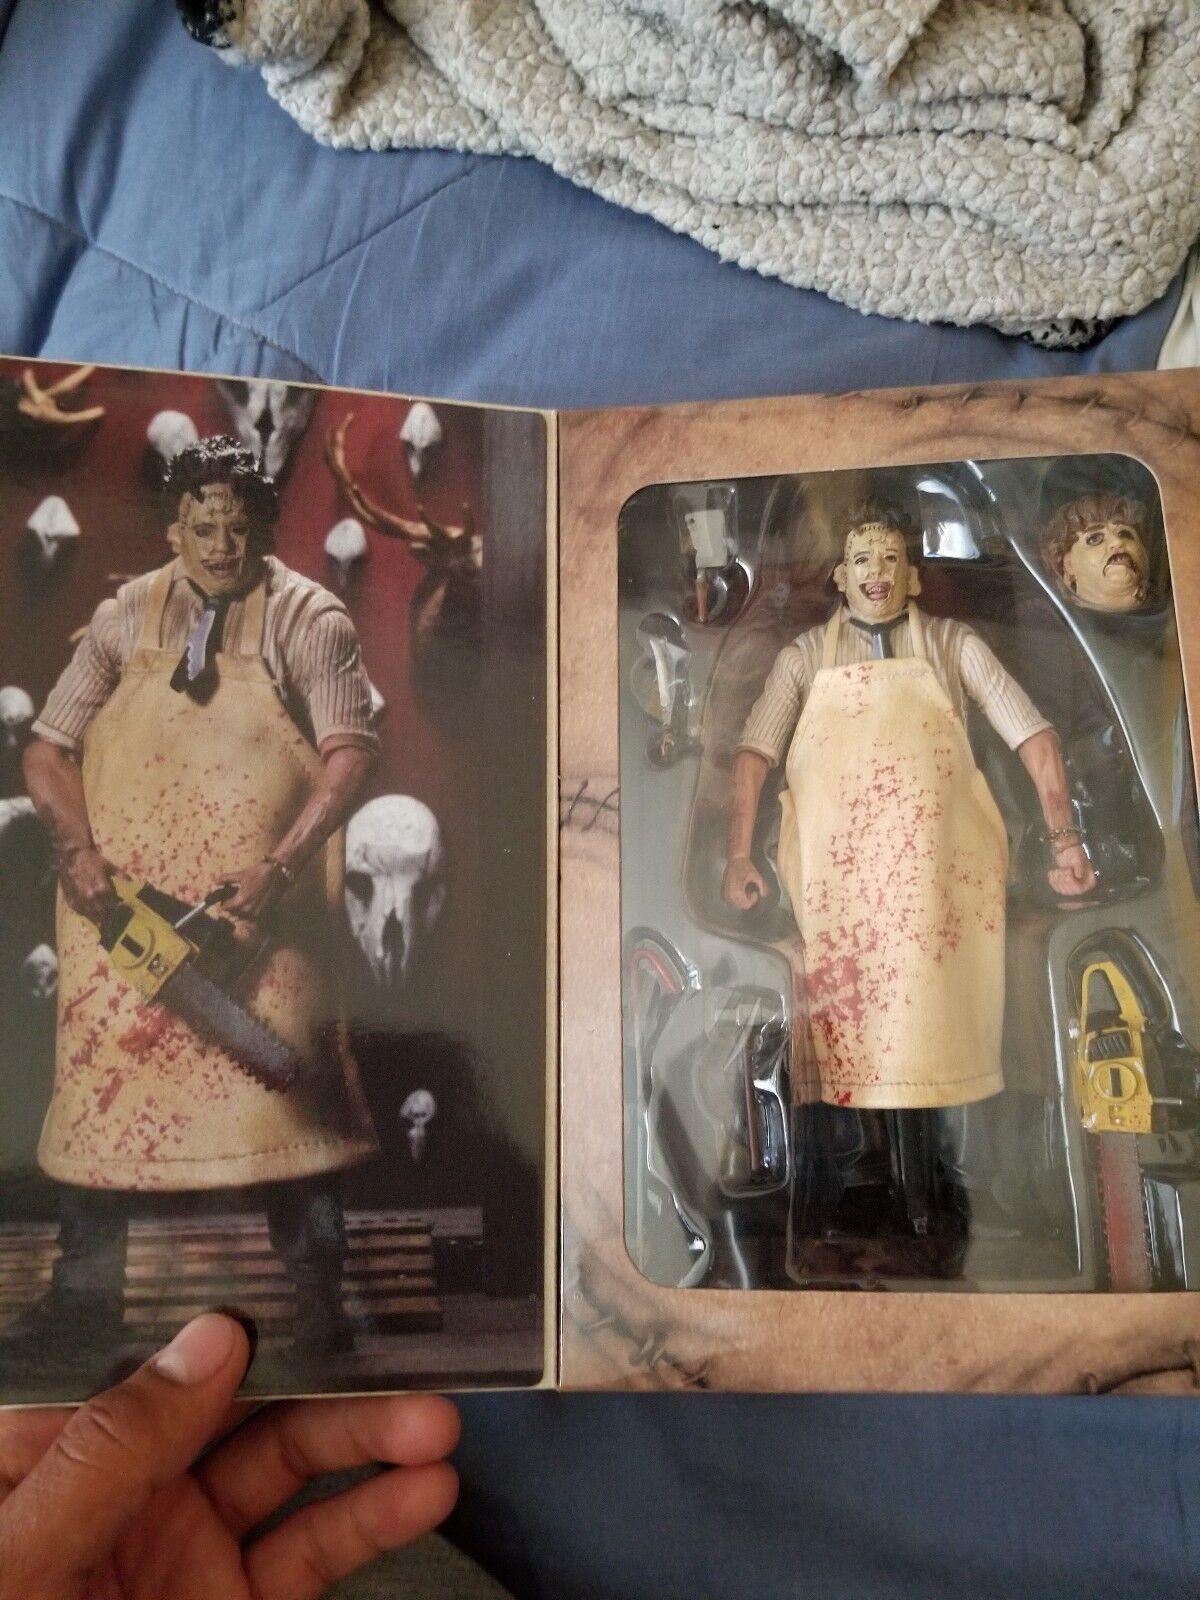 Texas chainsaw massacre figure ultimate version